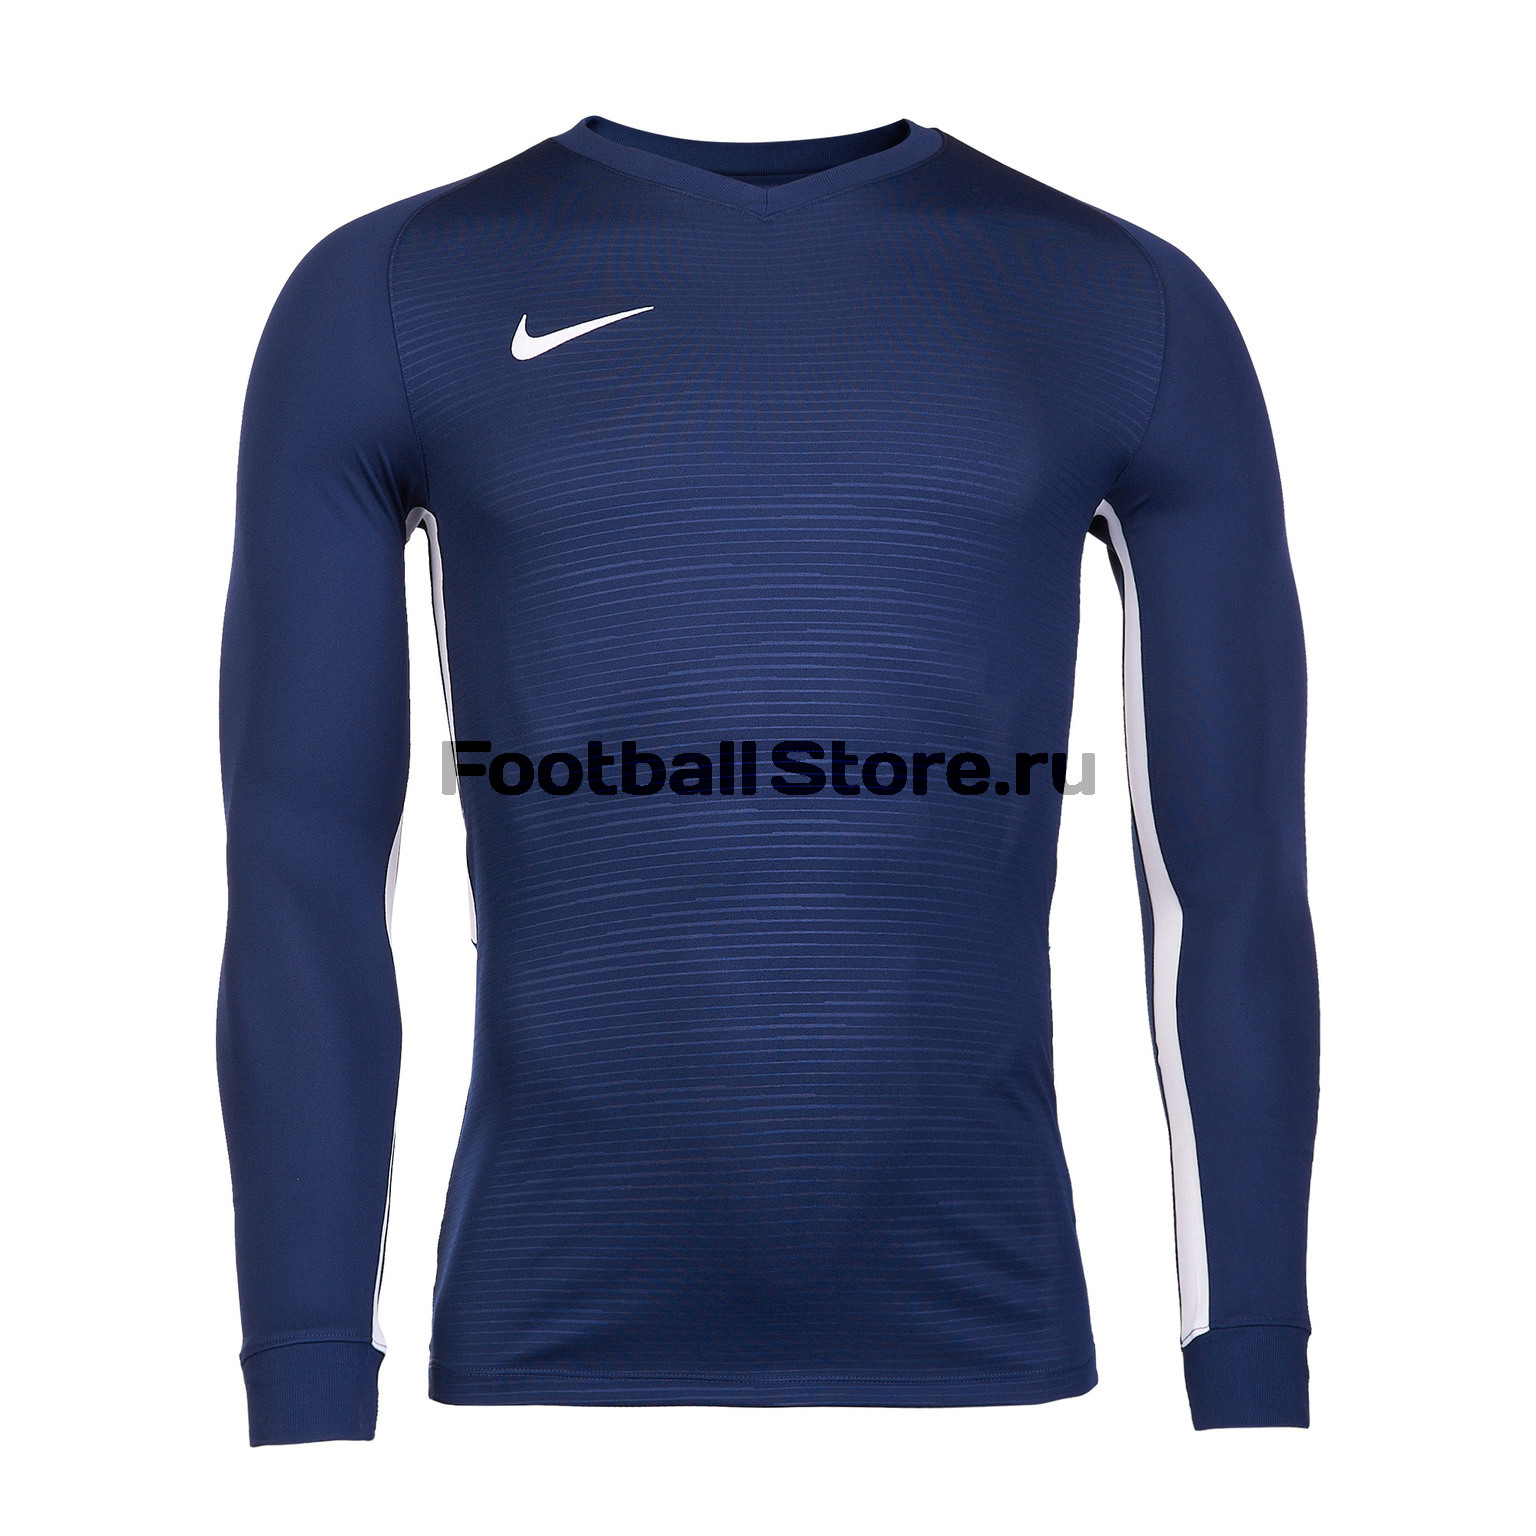 Футболка игровая Nike Dry Tiempo Prem JSY LS 894248-411 tiempo muerto